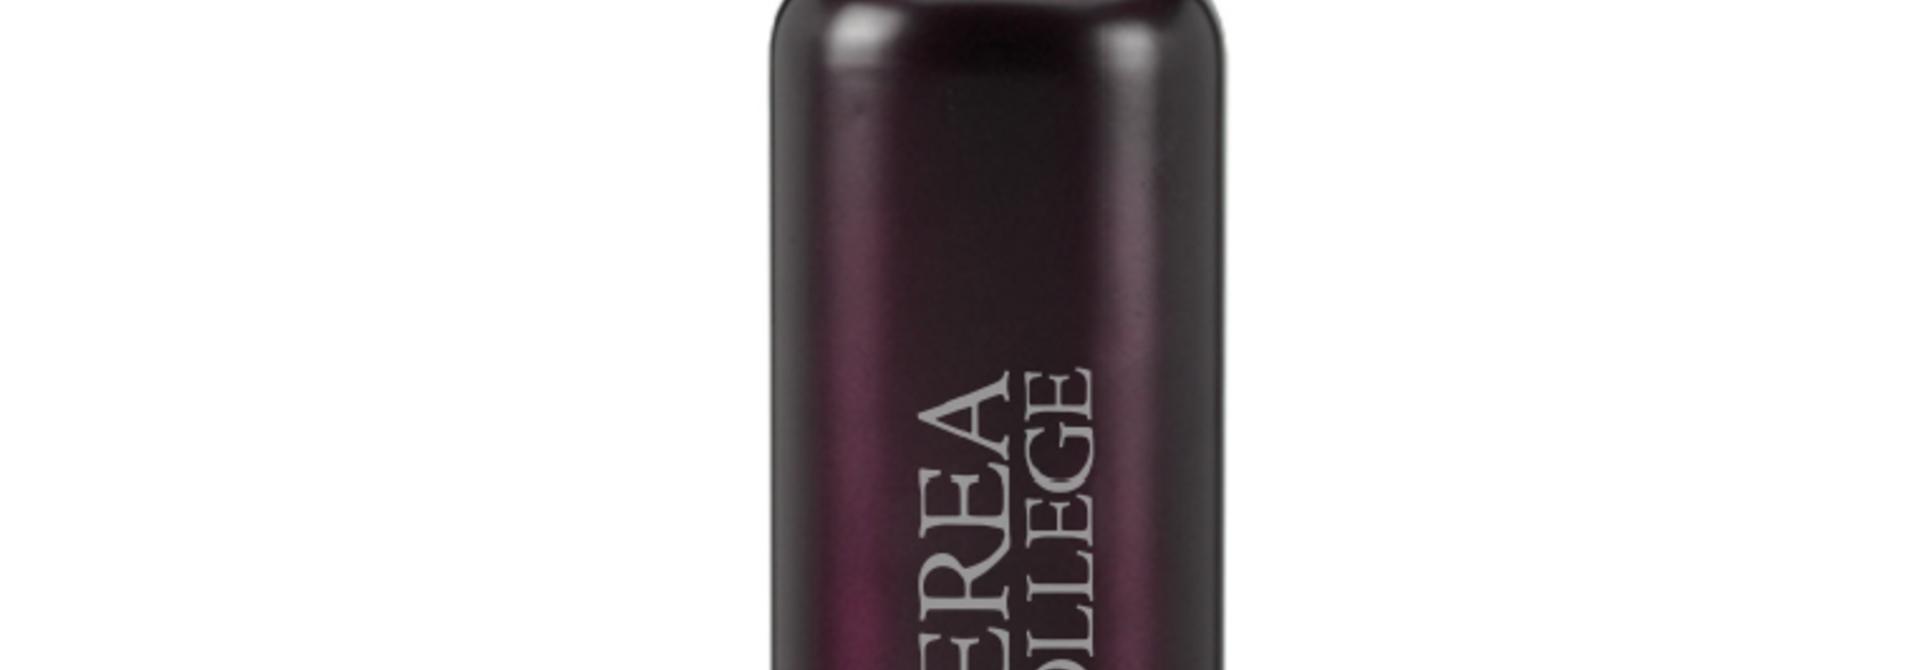 Berea College Stainless Steel Water Bottle